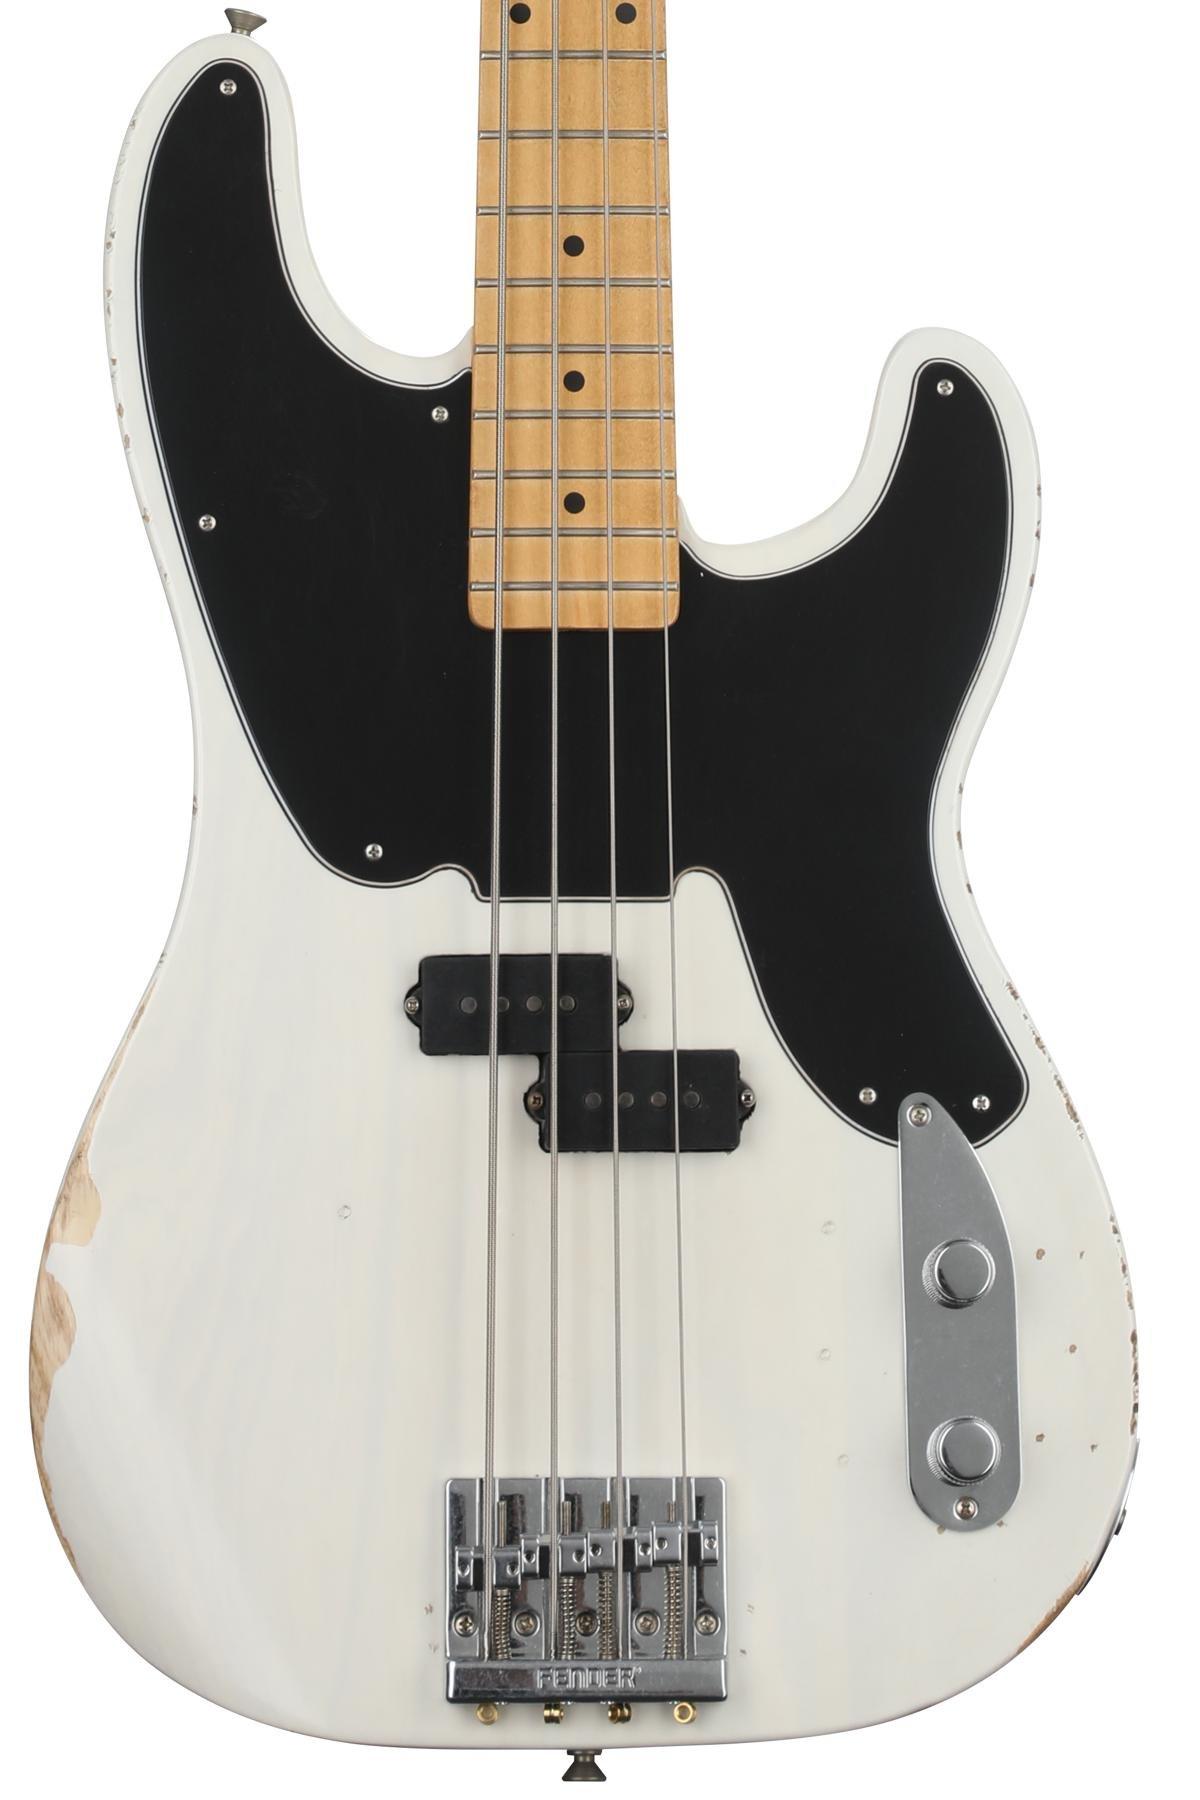 Fender Mike Dirnt Road Worn Precision Bass - White Blonde/Maple FB ...